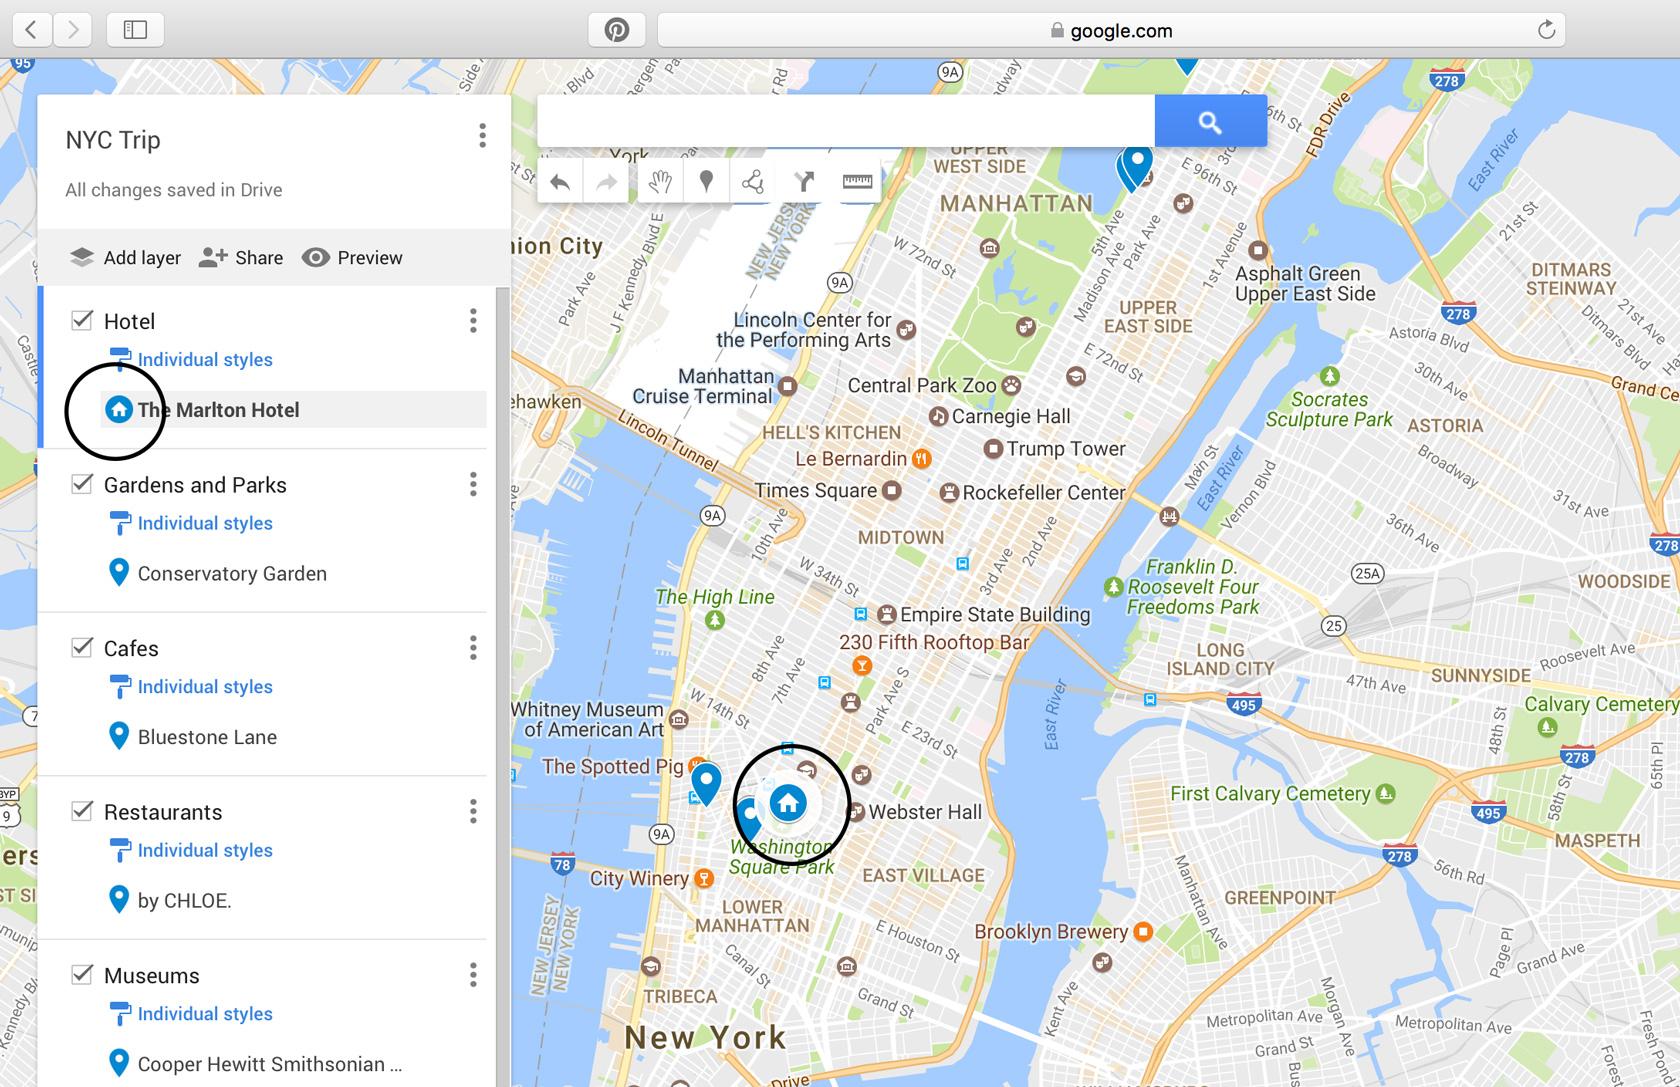 10 Step Tutorial to Make a Custom Google Map for Your Next Trip